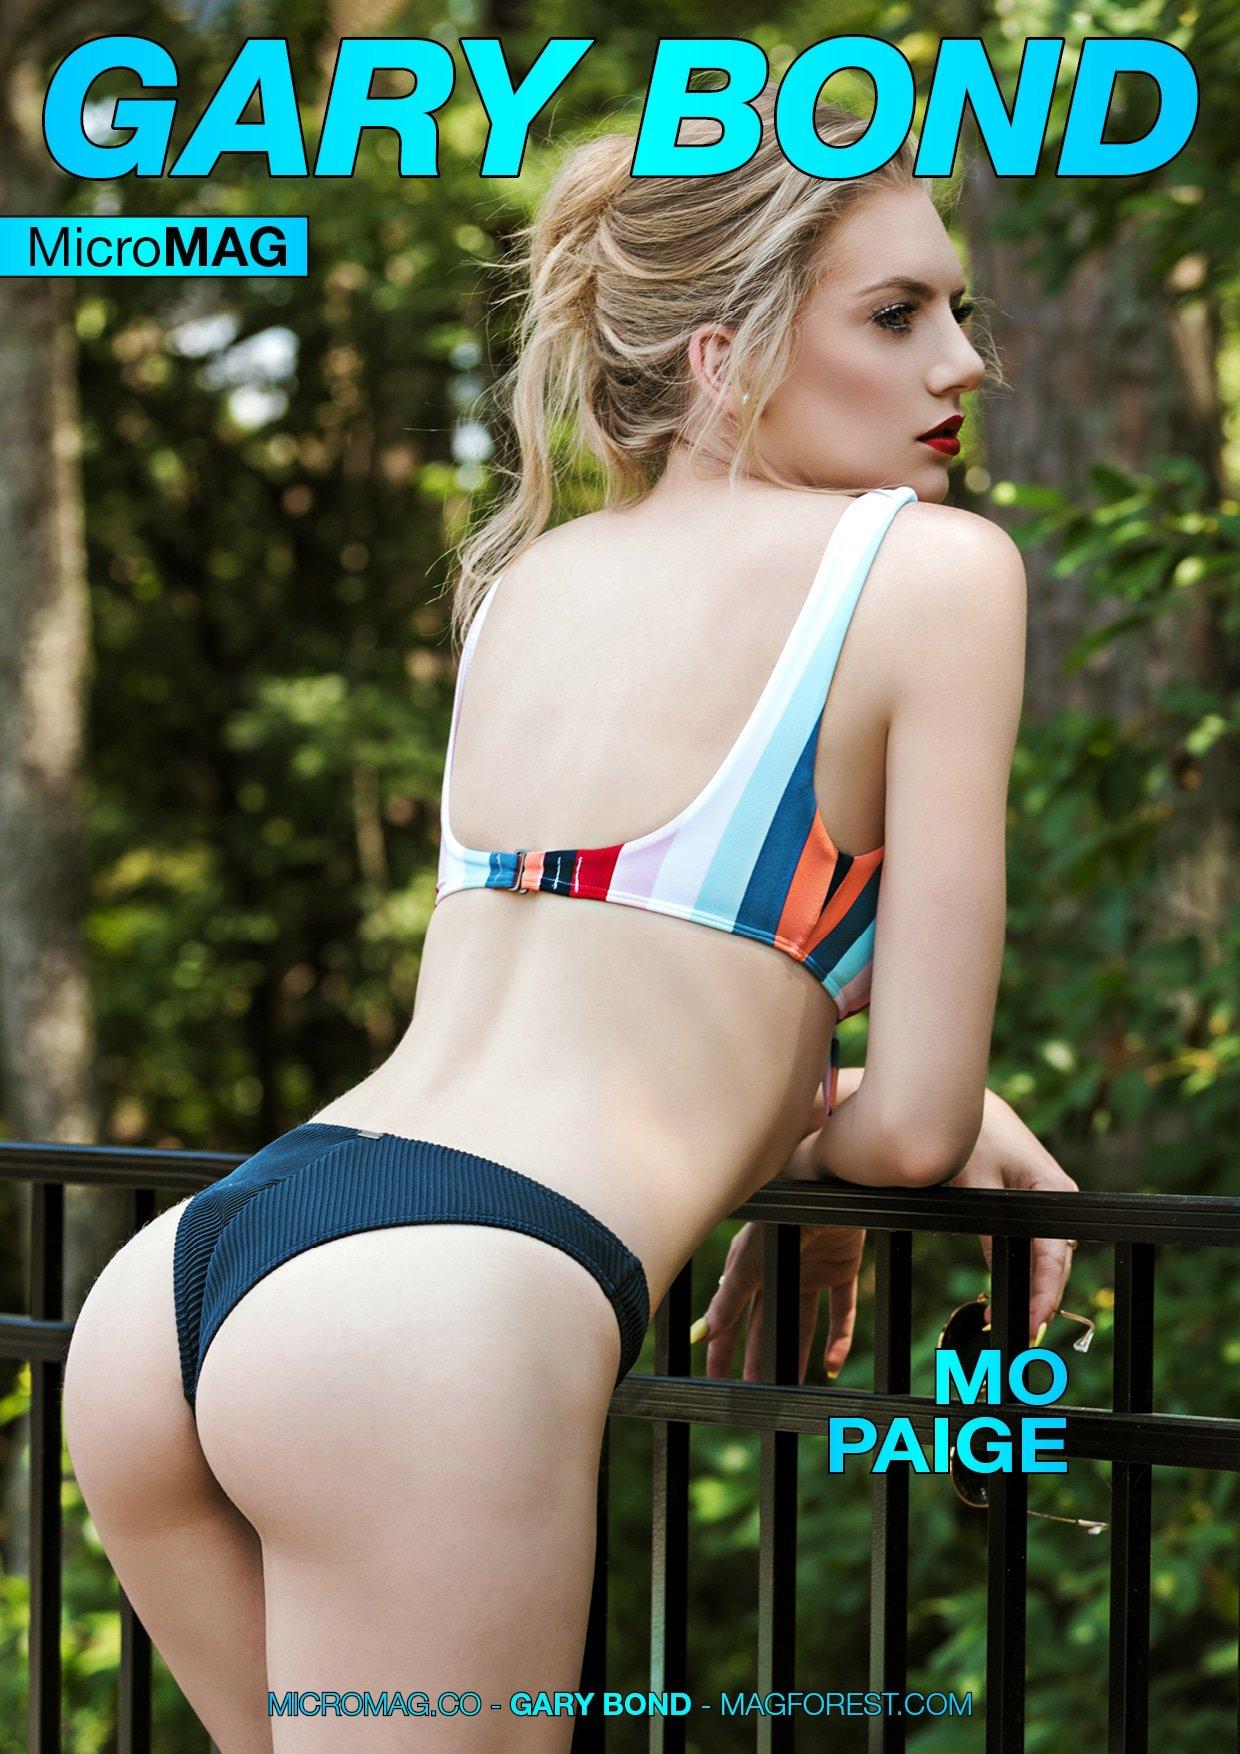 Gary Bond MicroMAG - Mo Paige 1